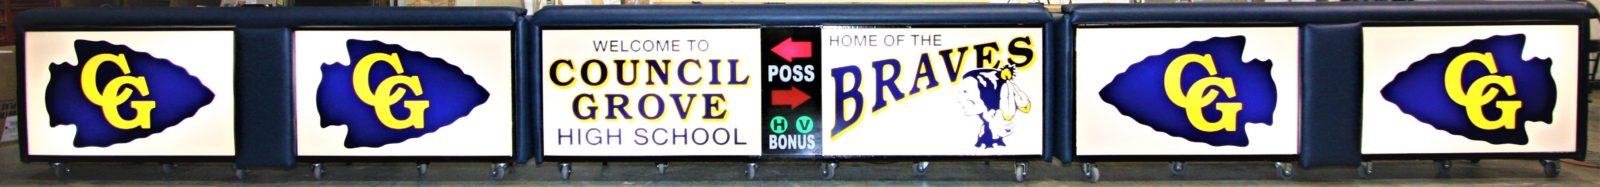 Council Grove High School